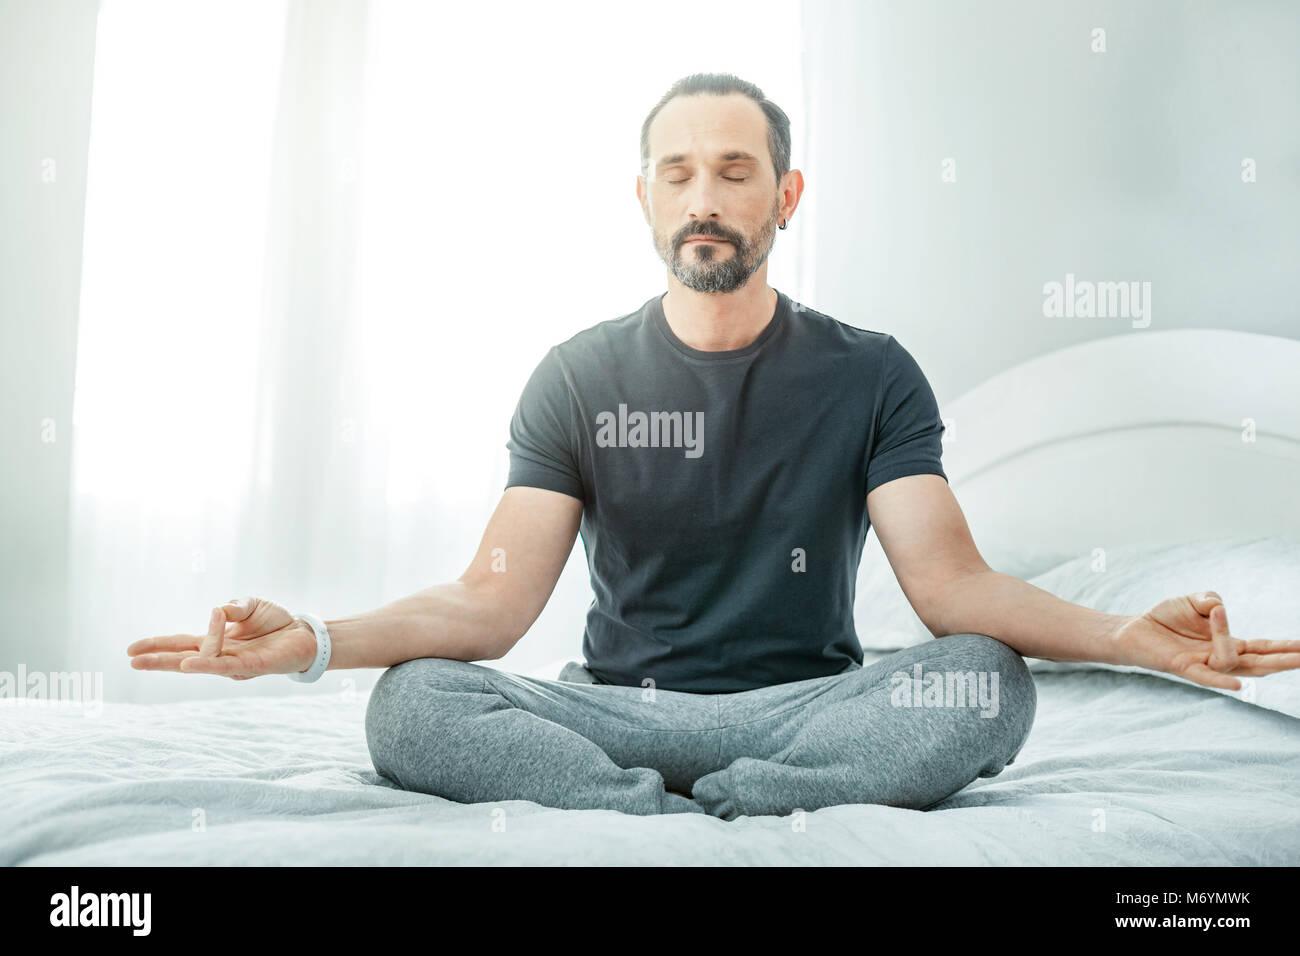 Handsome unshaken man sitting and meditating. - Stock Image